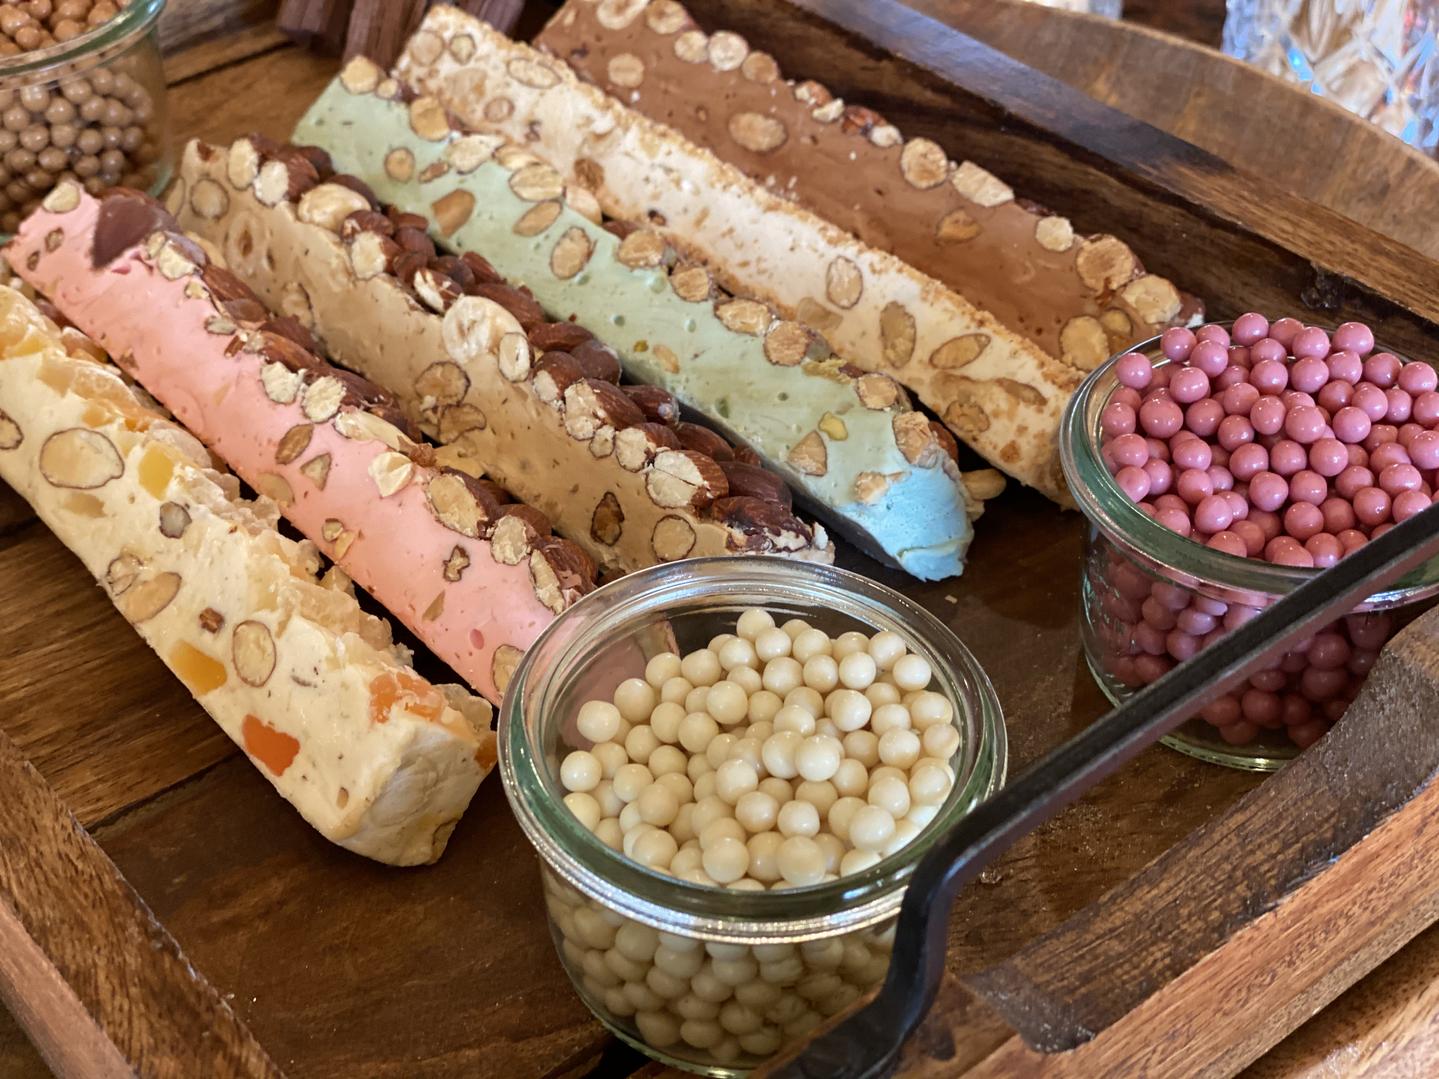 Candybar Lunch & Sweet im Hotel Wegner - the culinary art hotel